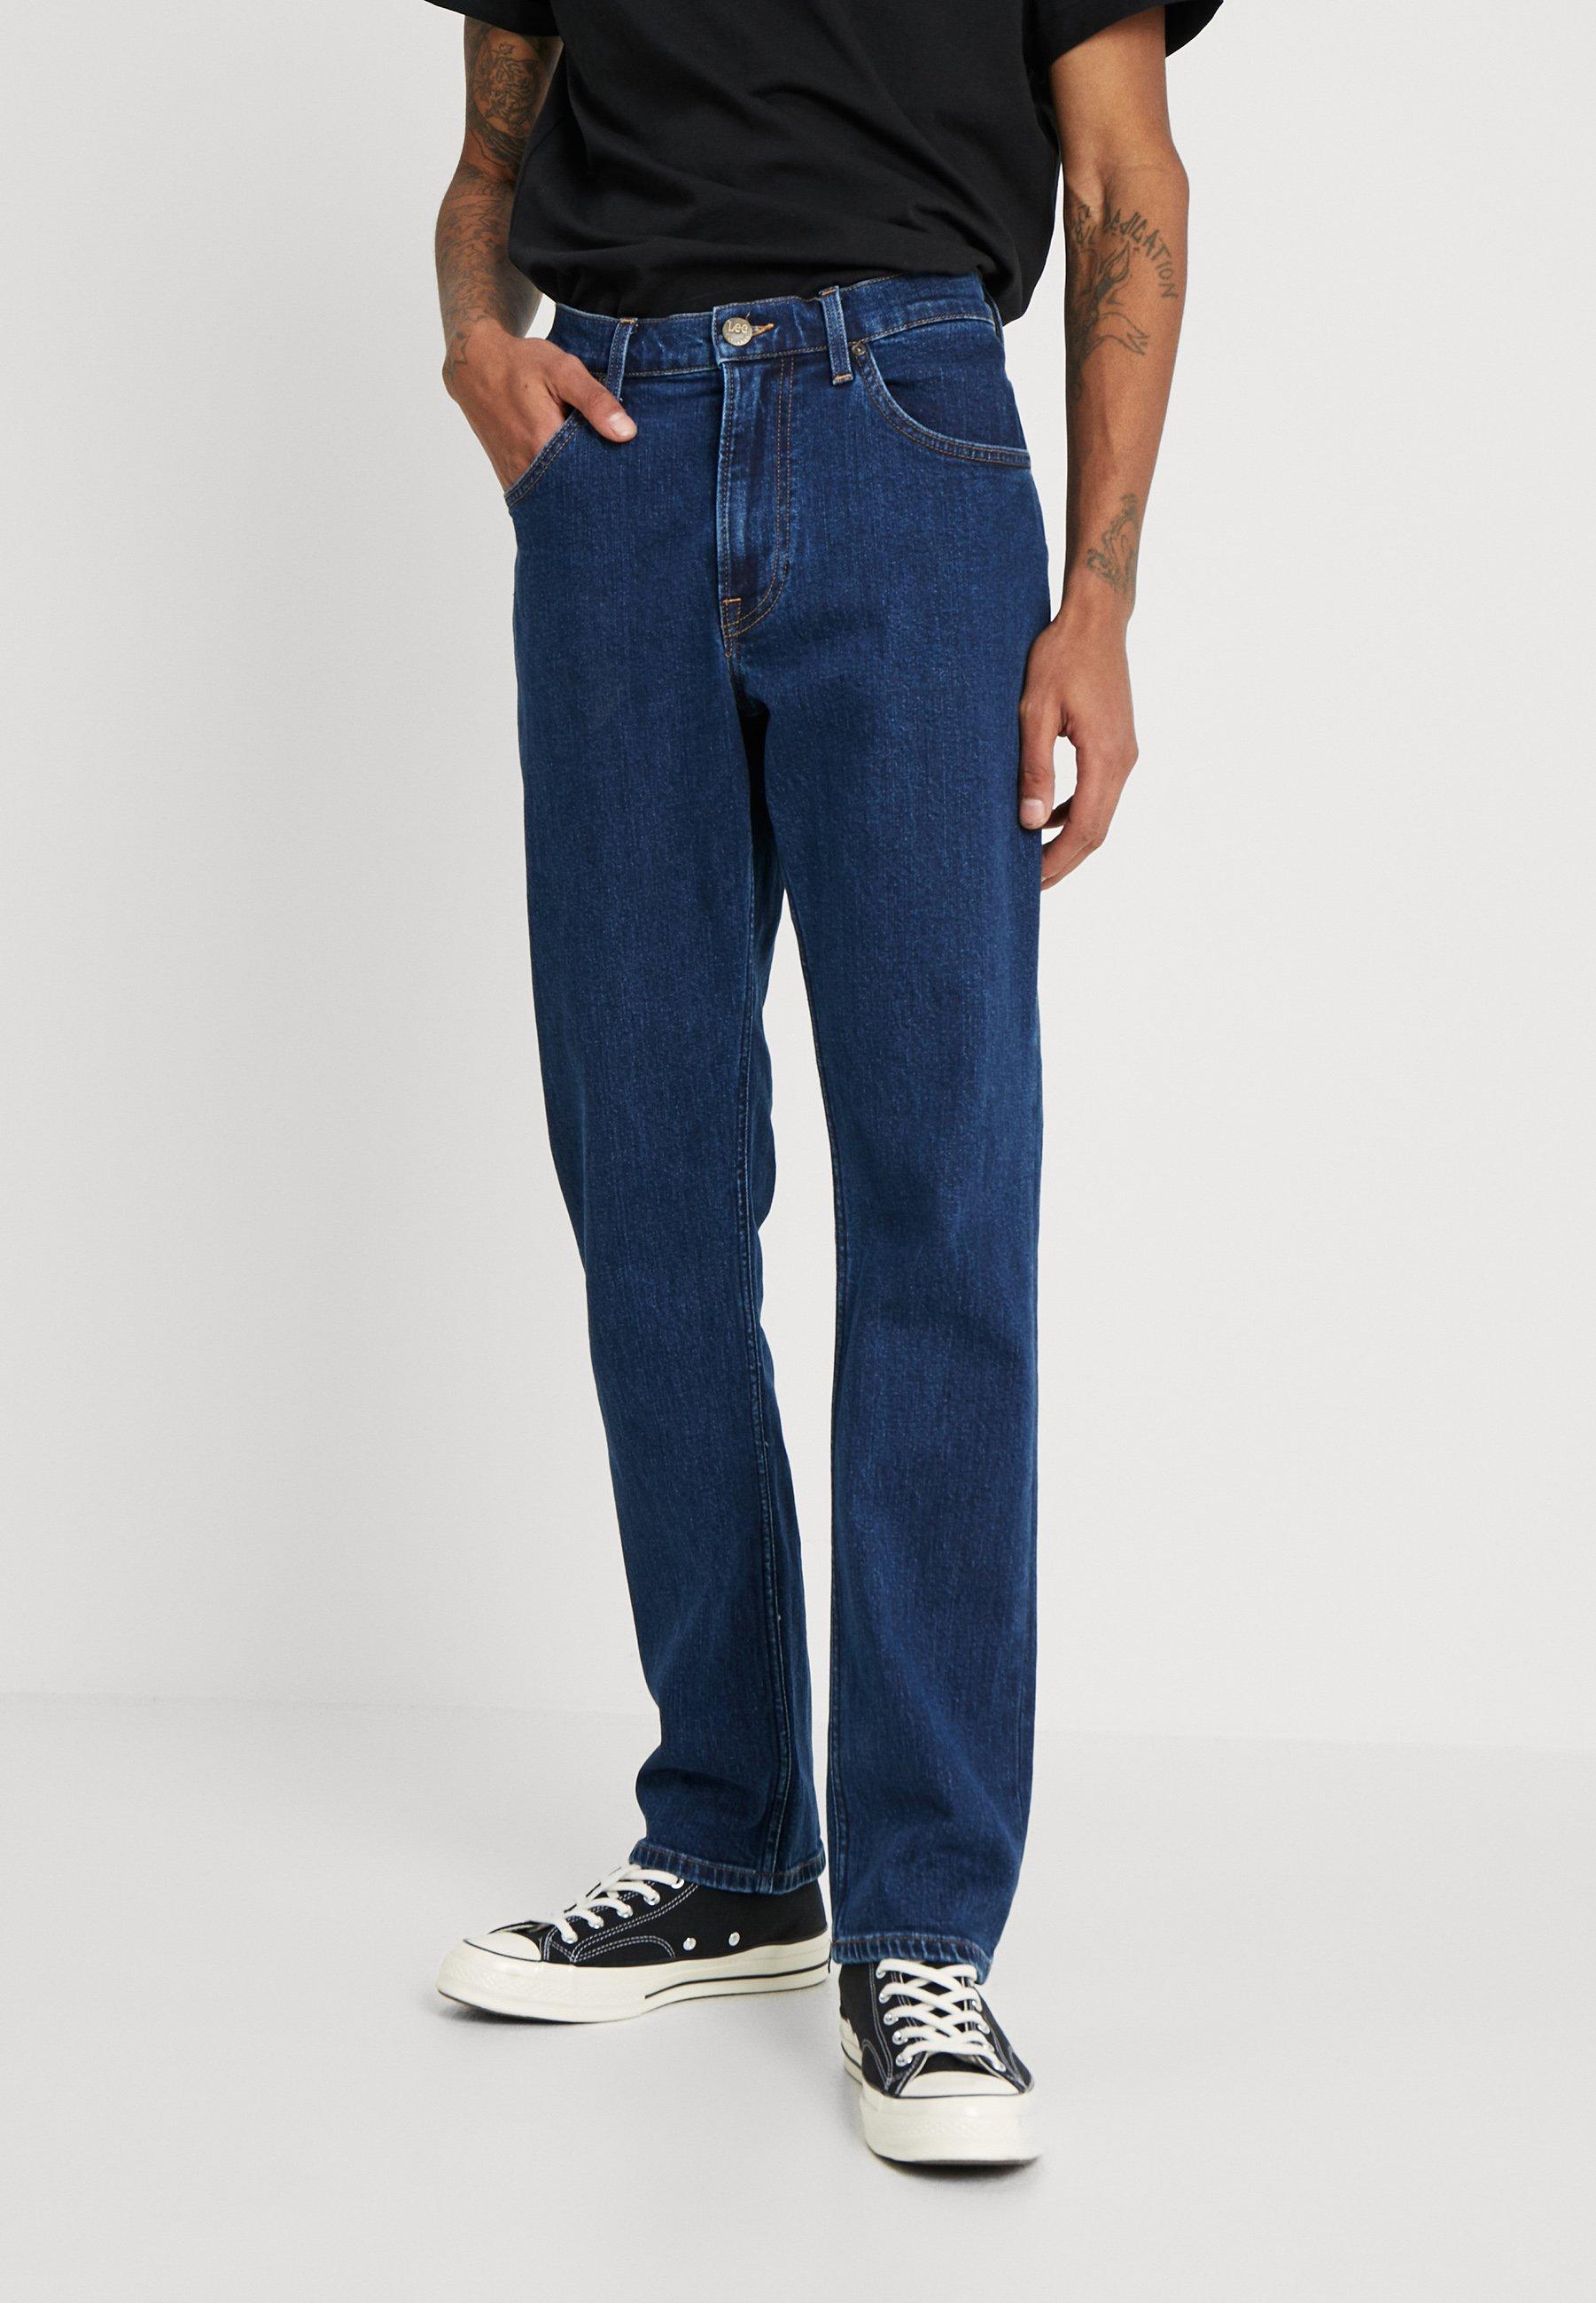 Lee Men Black /'Rinse/' Wash /'Brooklyn/' Comfort Fit Jeans